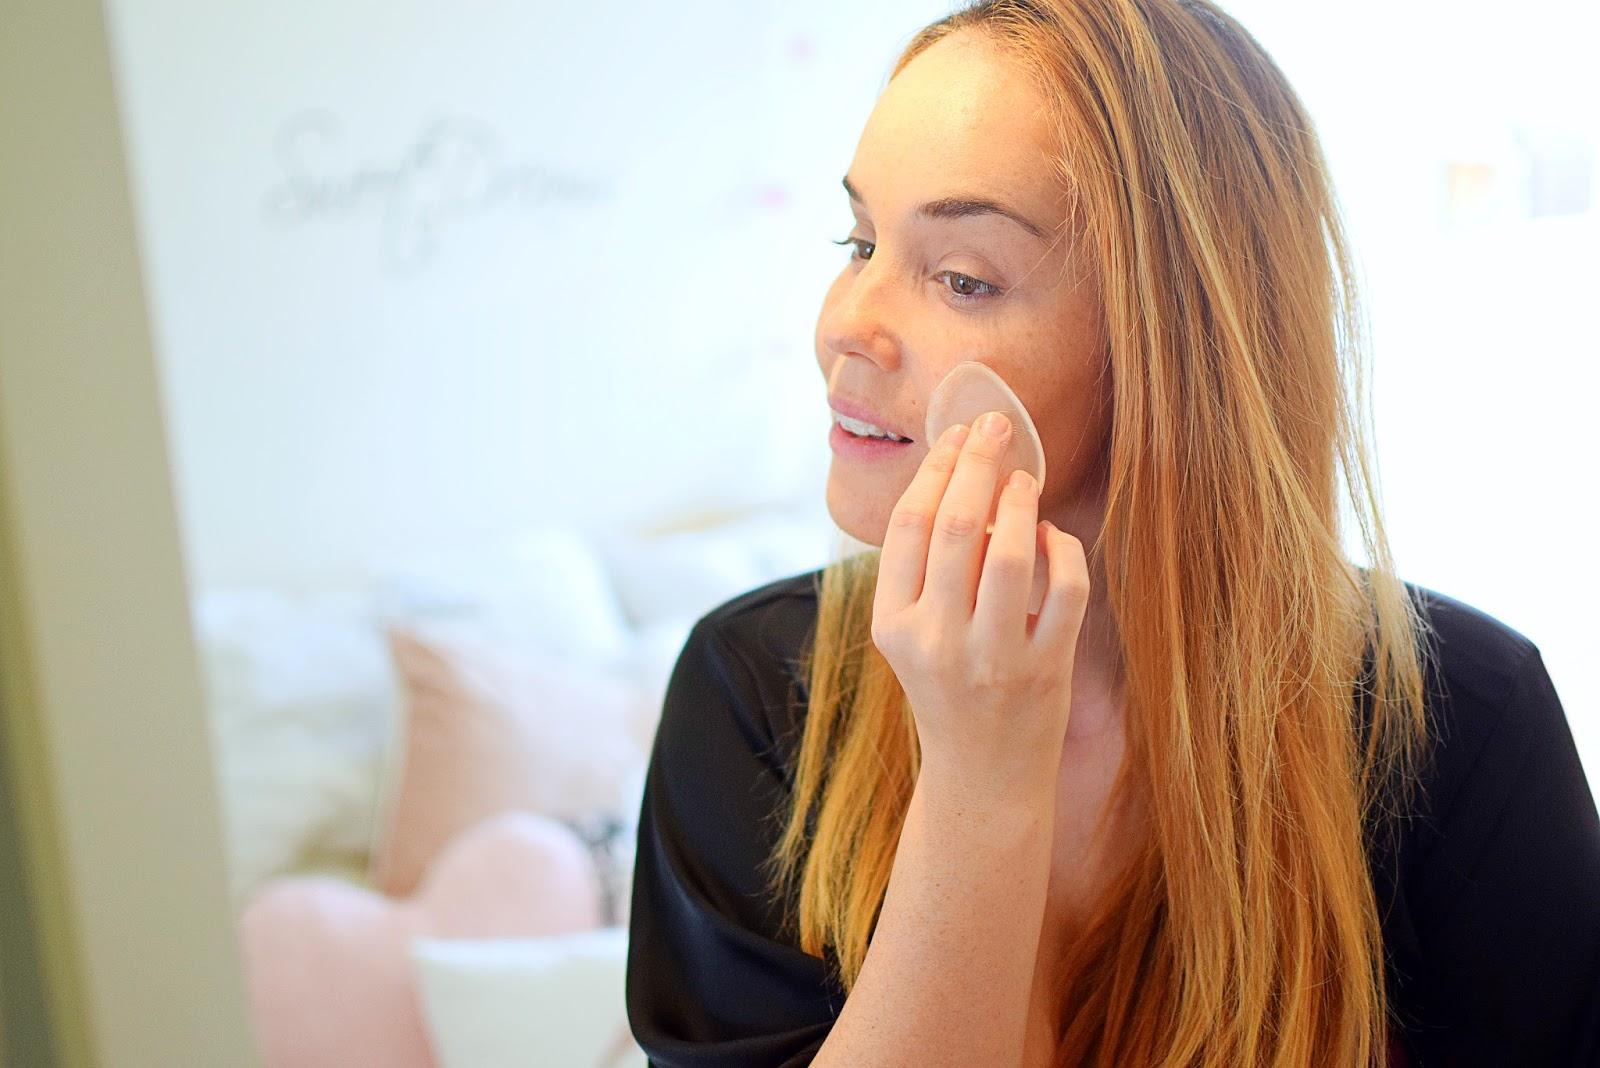 NERY HDEZ, make up, silidrop, maquillaje, belleza, trucos para maquillarse